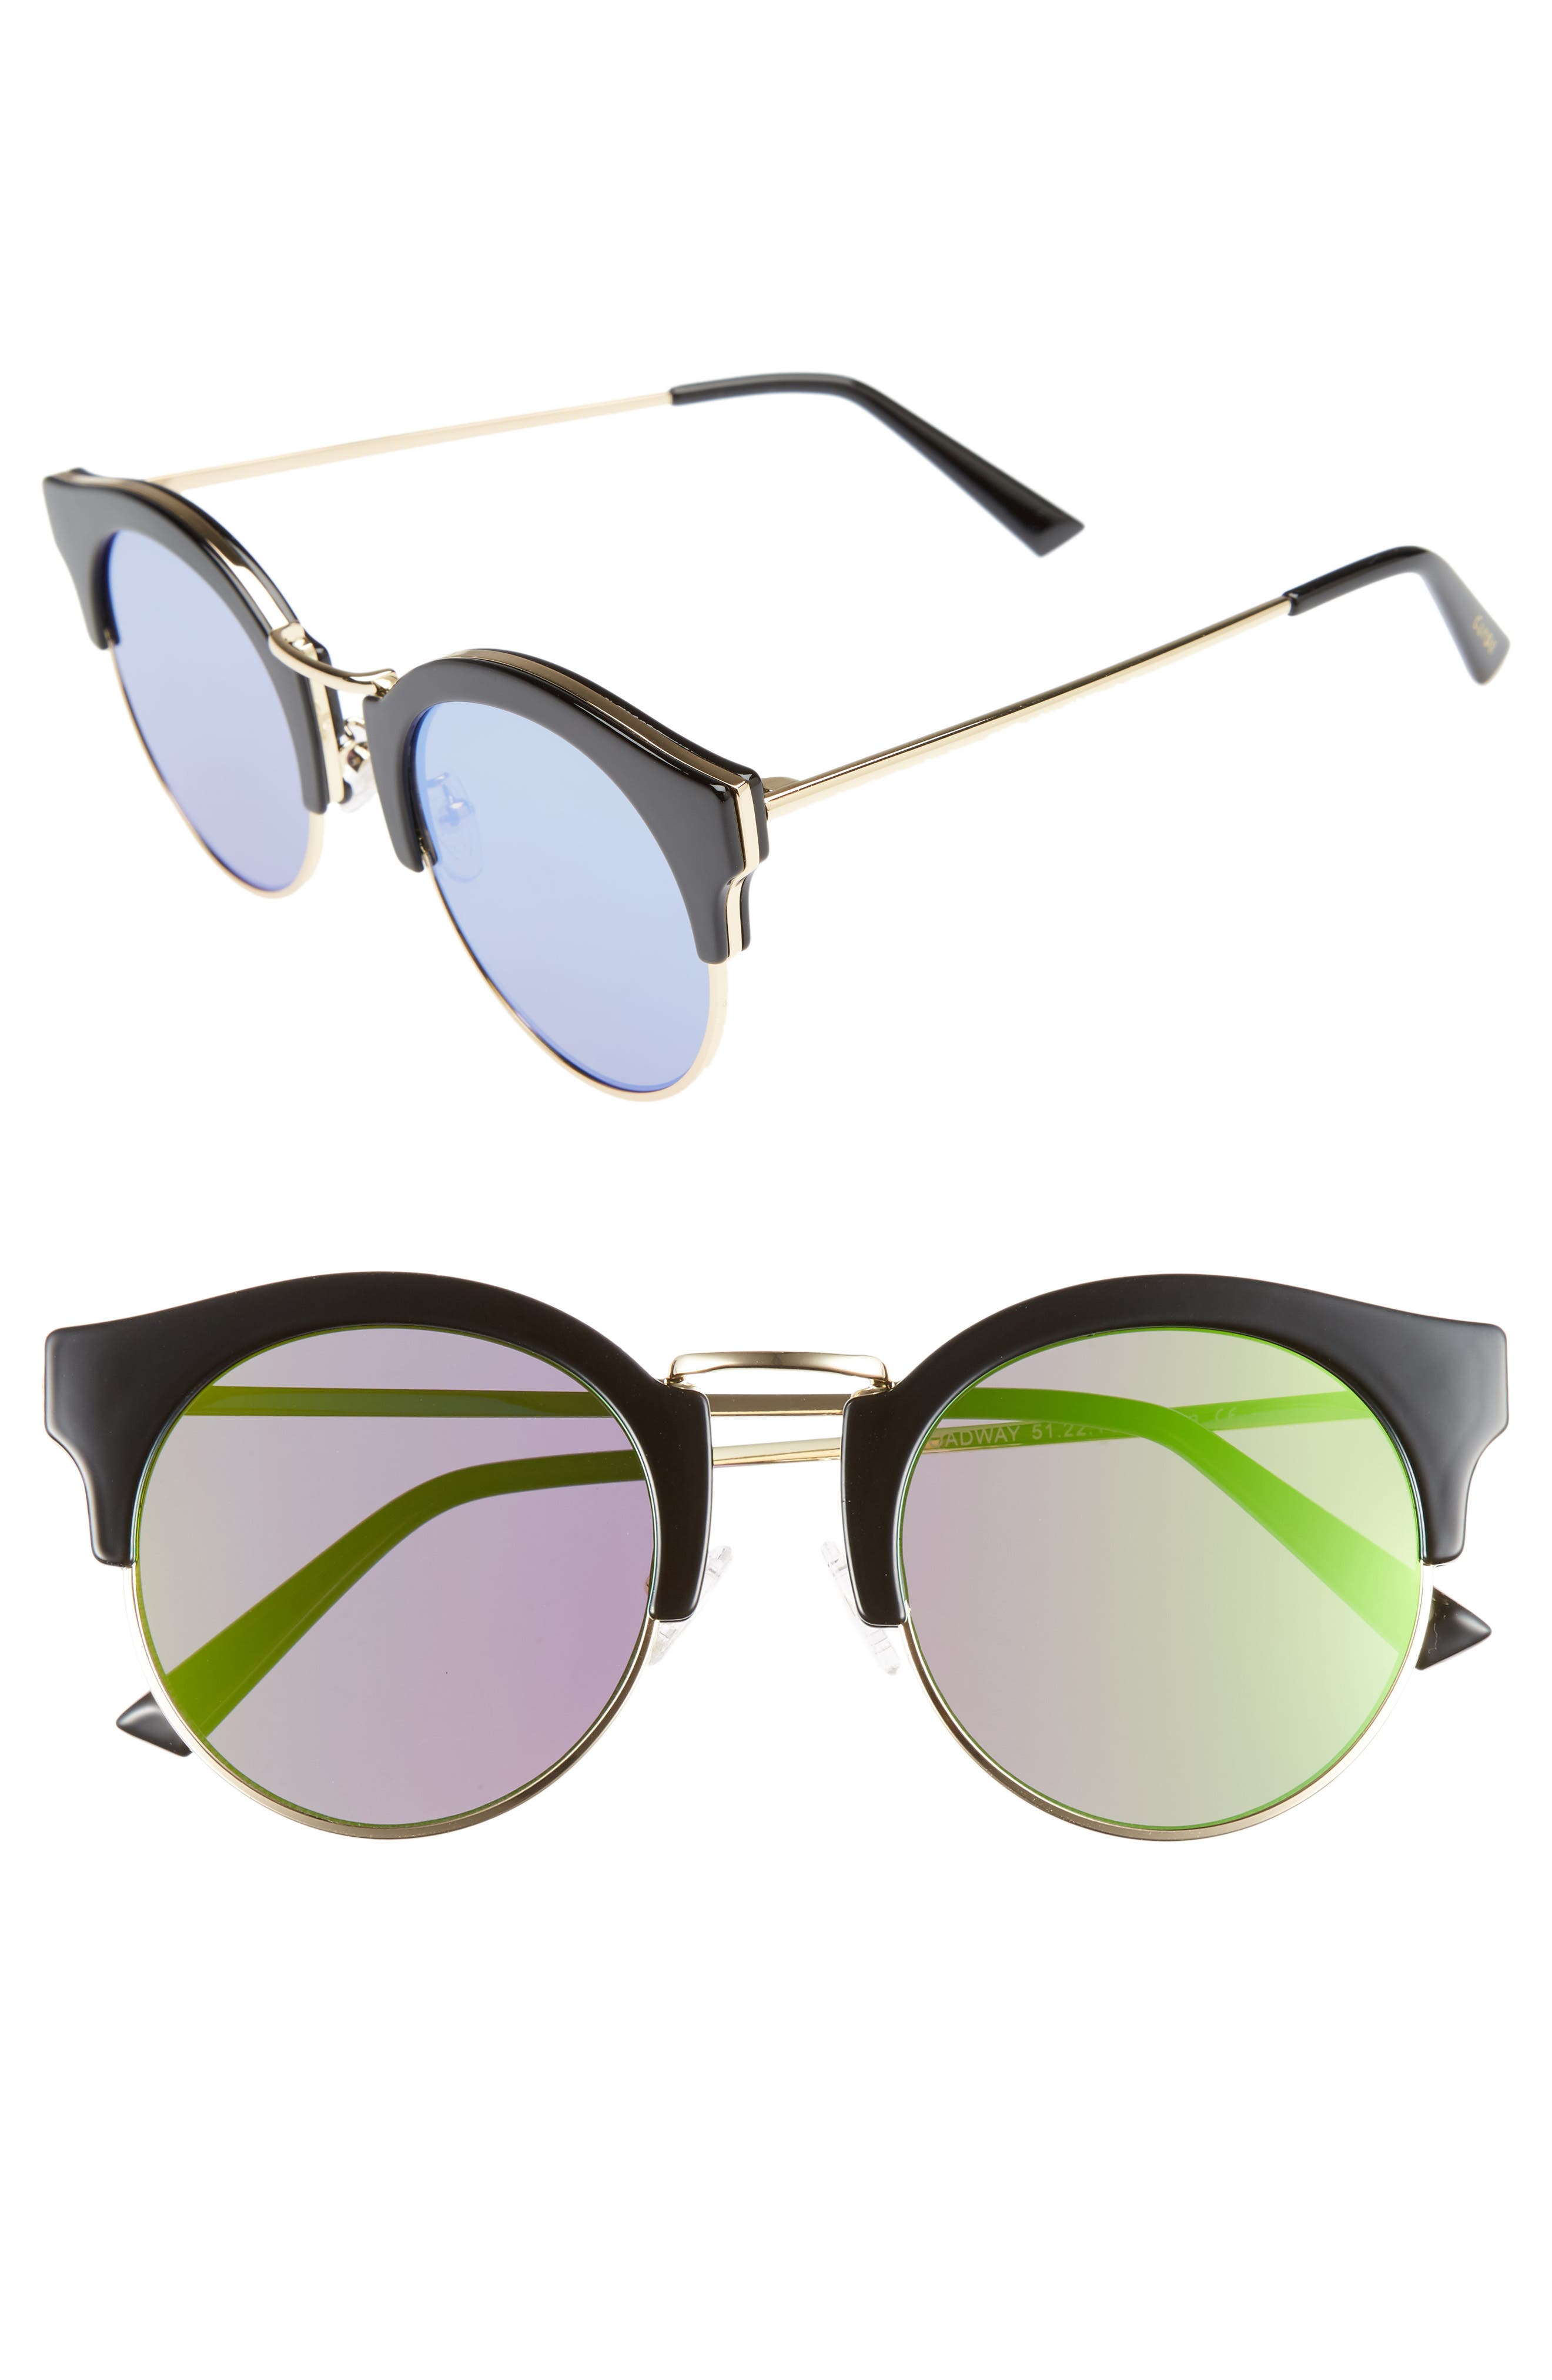 Broadway 51mm Retro Sunglasses,                             Main thumbnail 1, color,